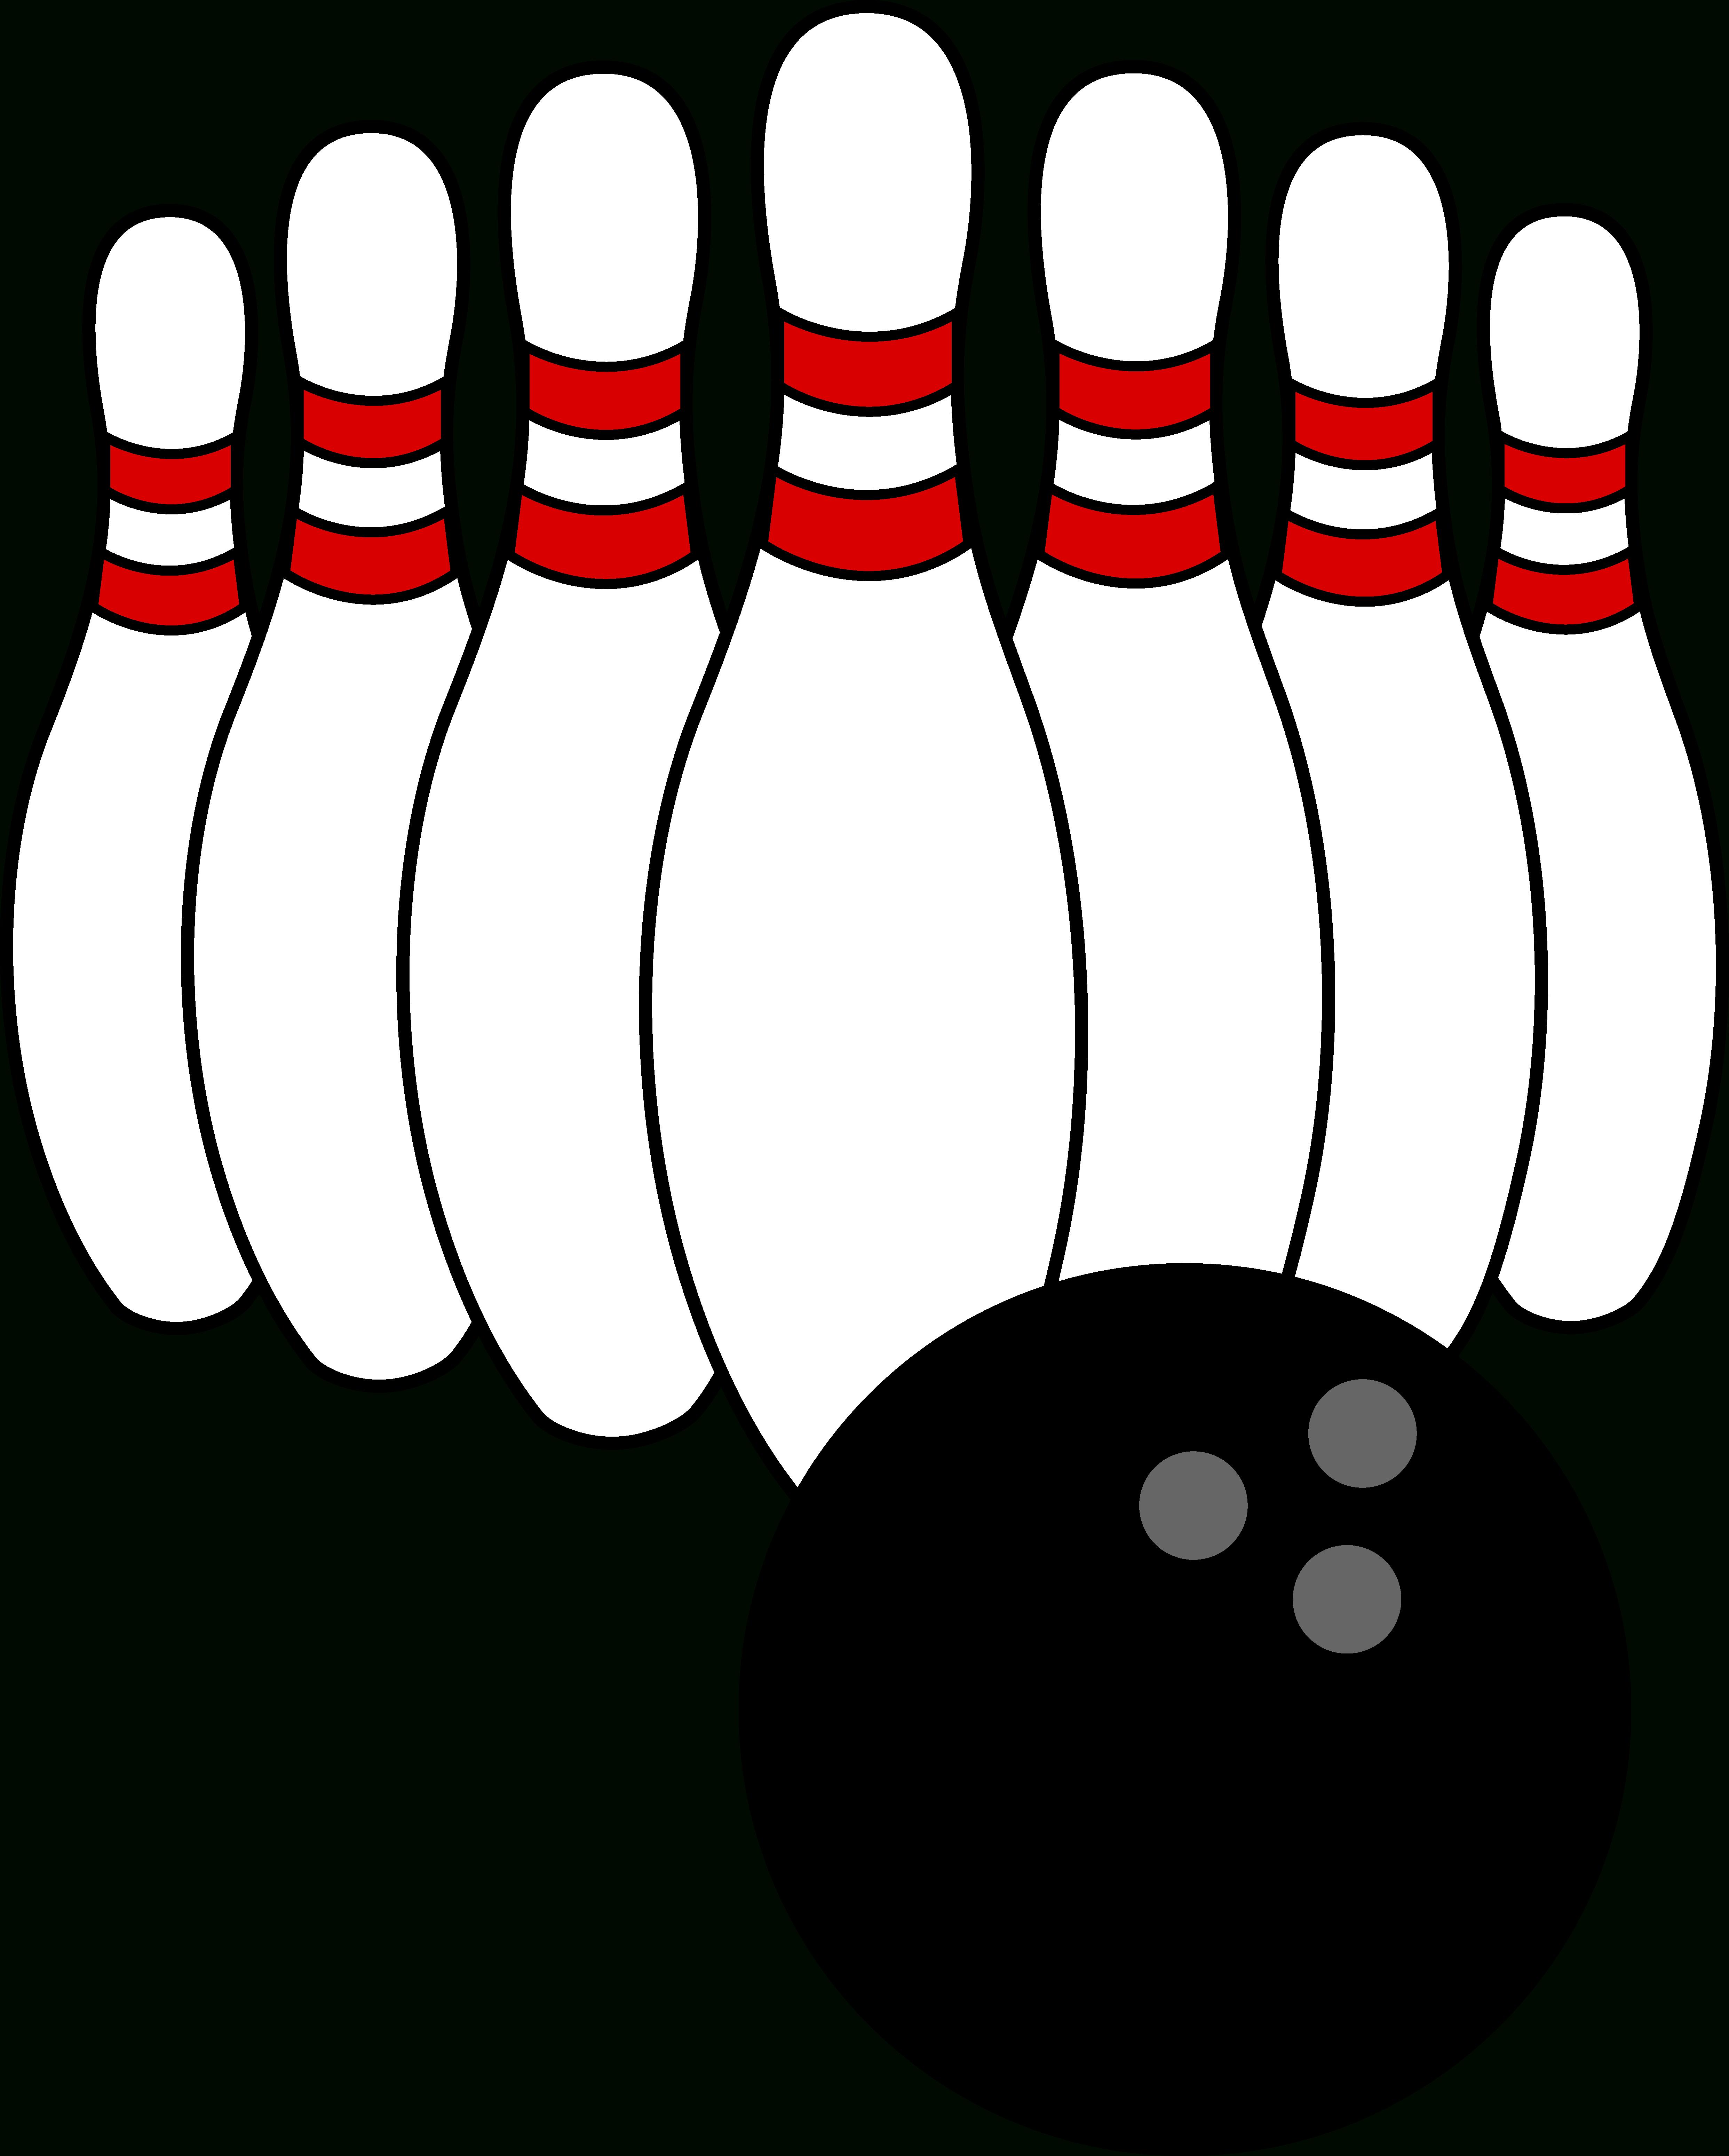 Bowling Clip Art | Bowling Ball And Pins | Bowling | Bowling Ball - Free Printable Bowling Clipart